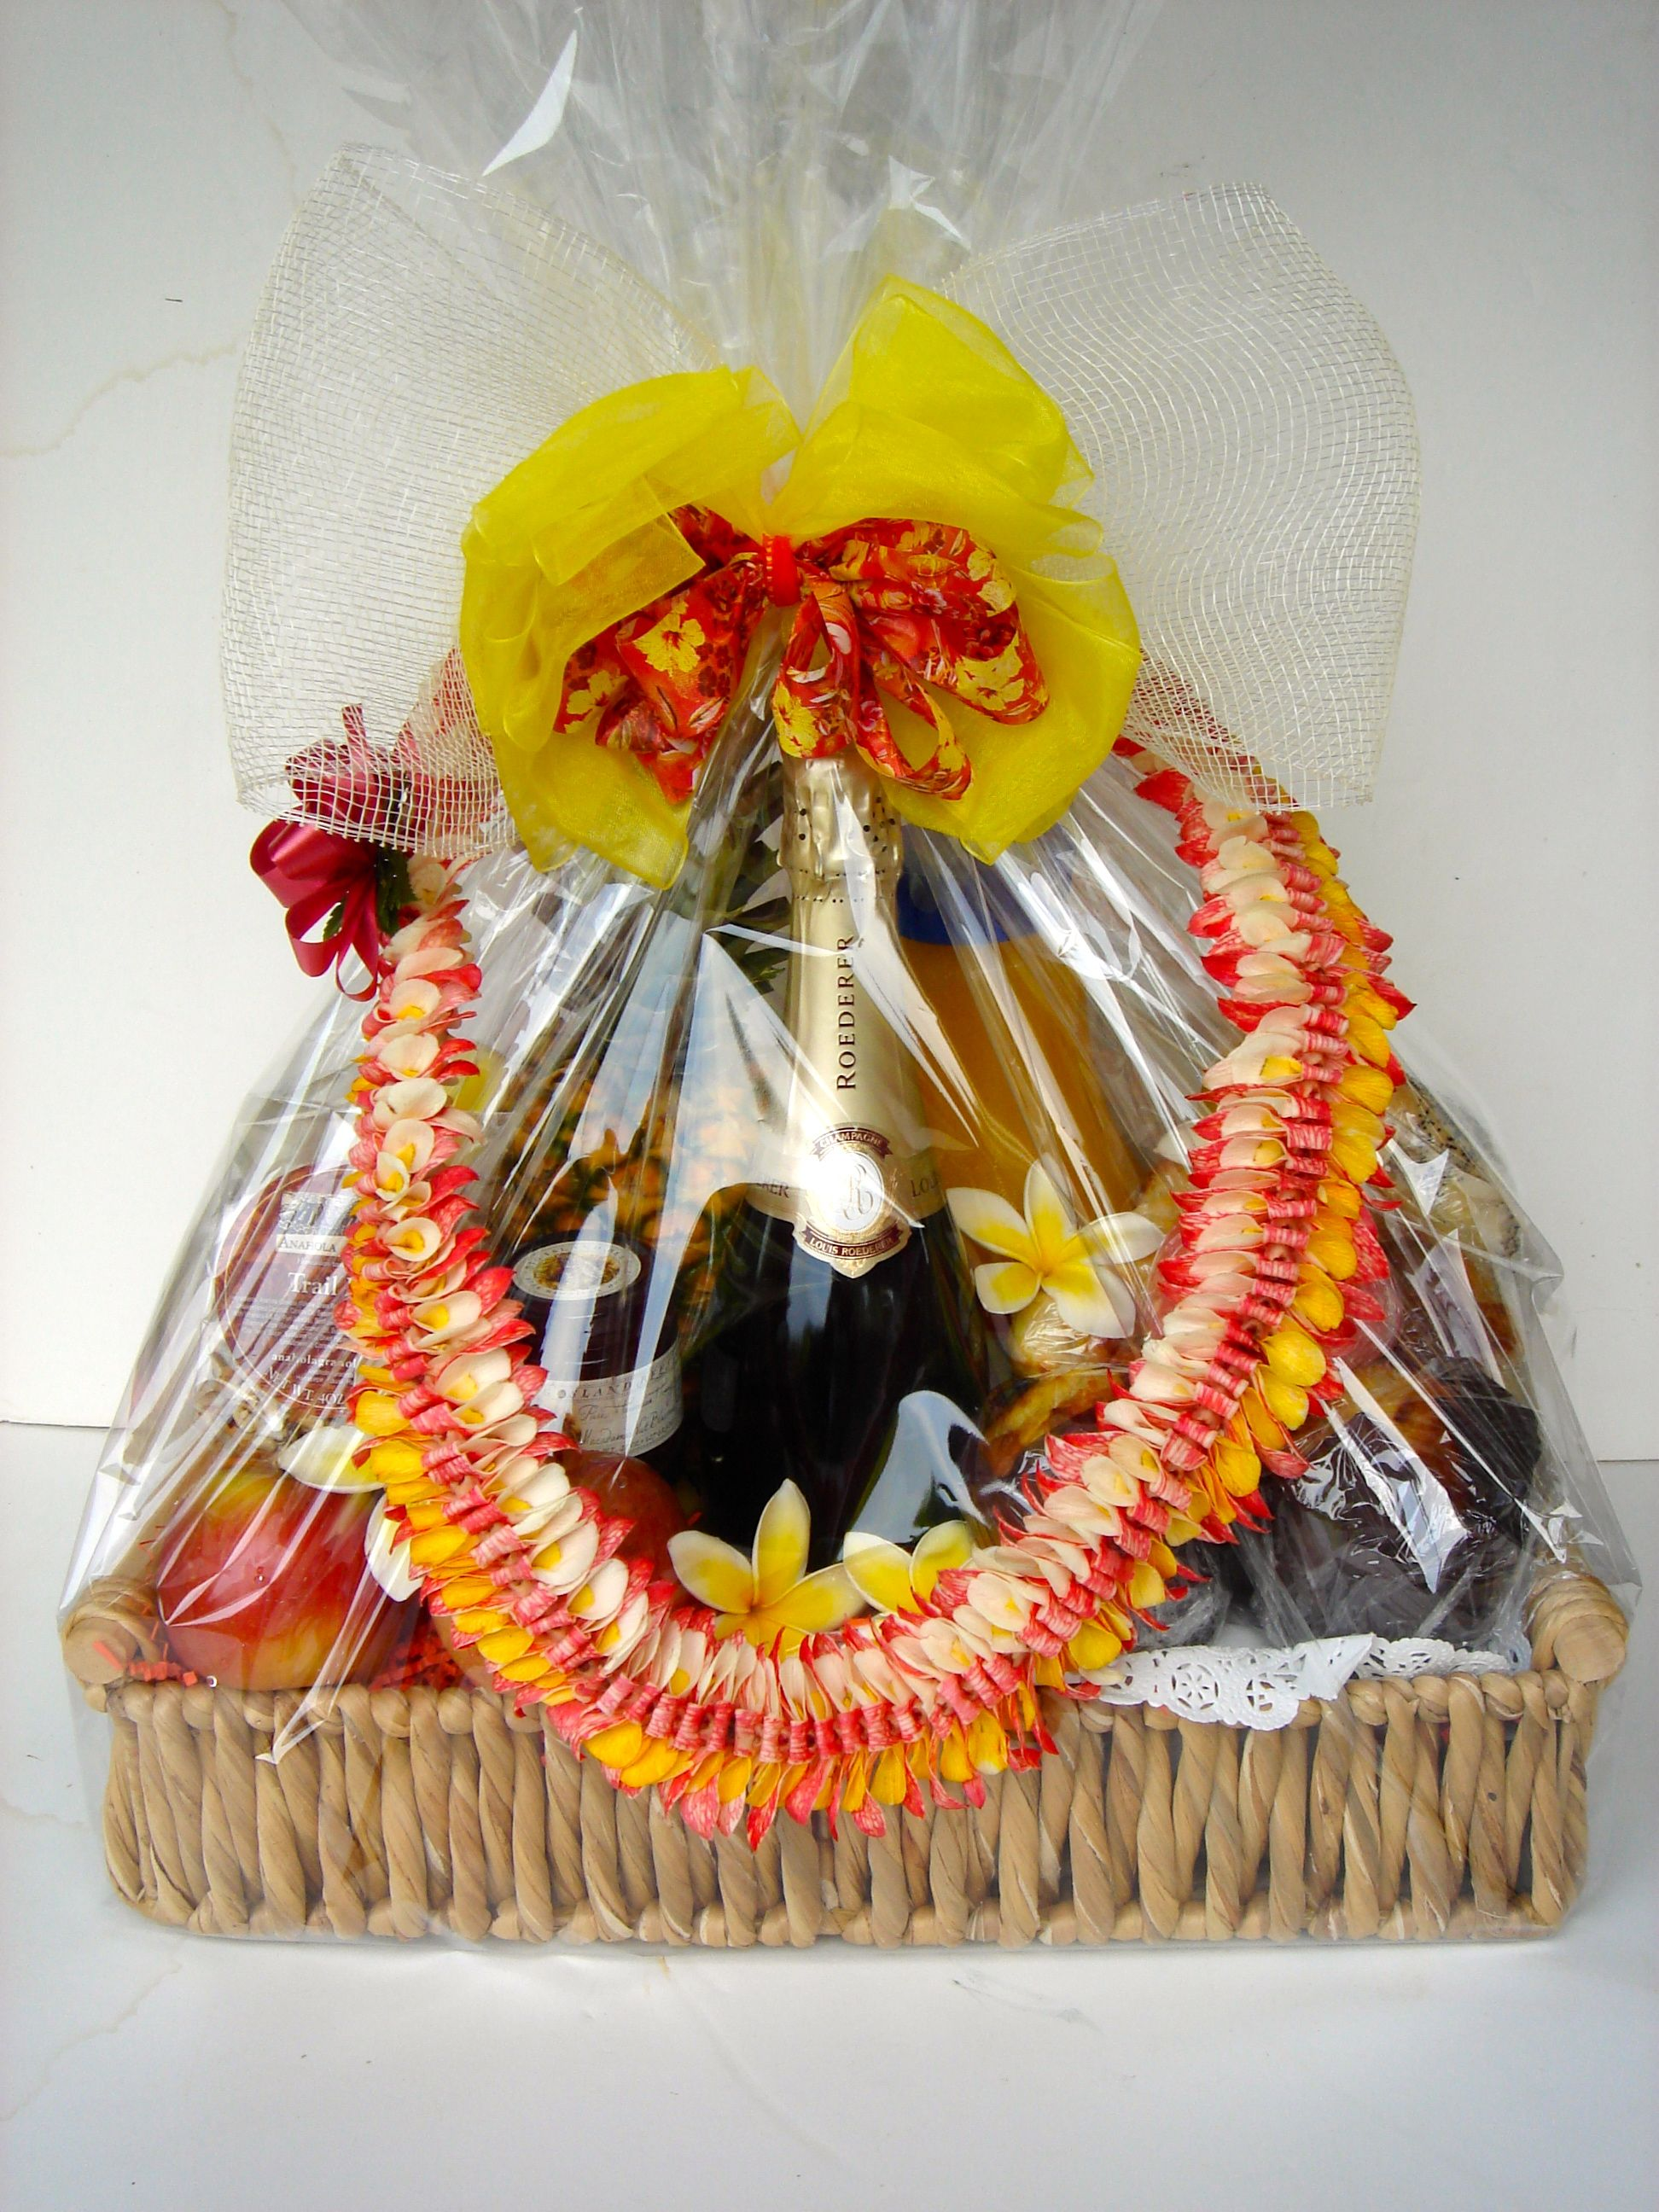 Awesome custom hawaiian gift basket with fresh